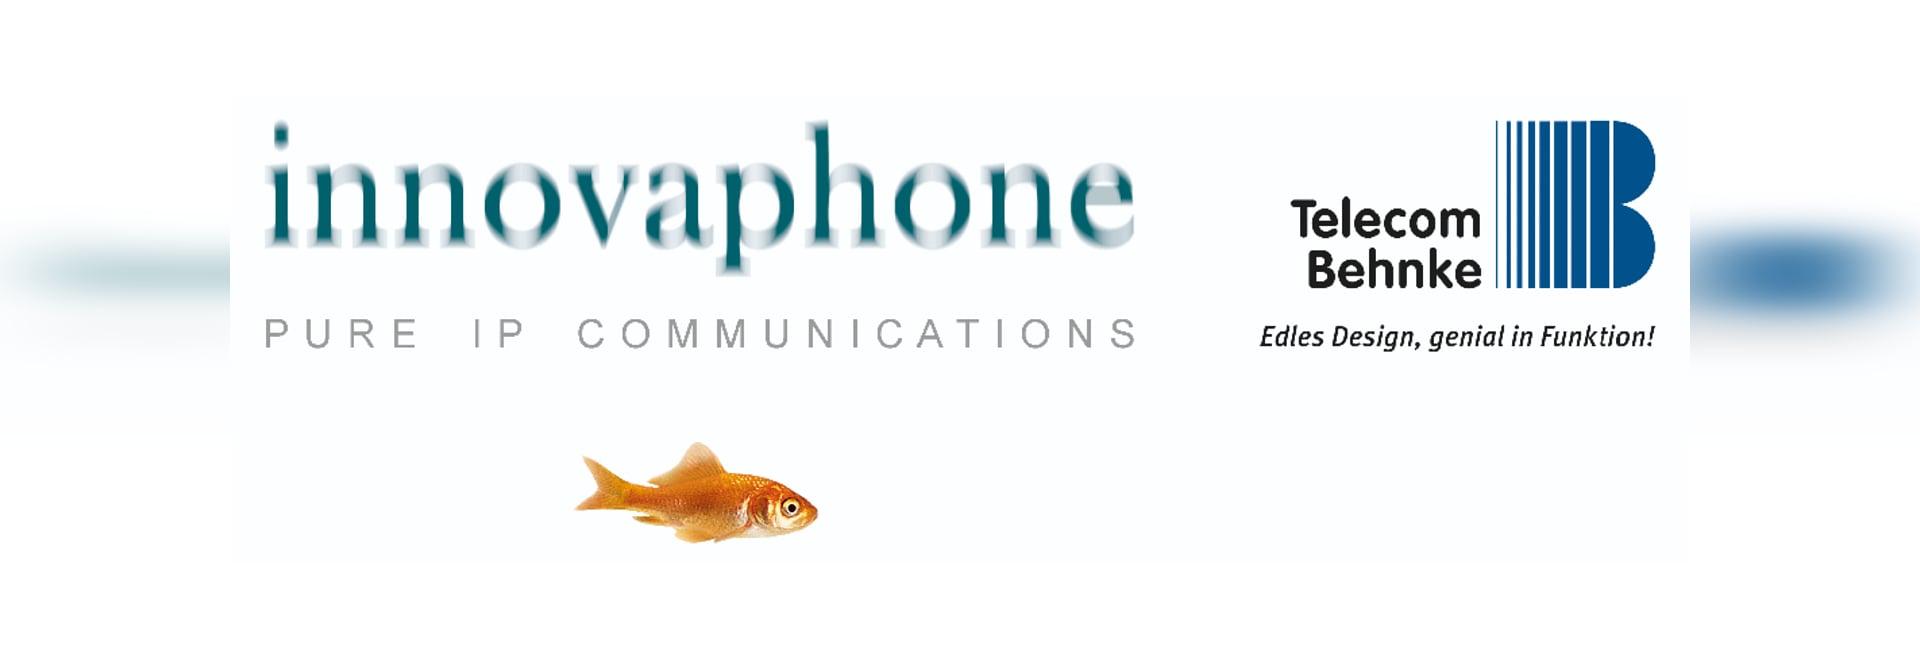 innovaphone und Behnke Logos